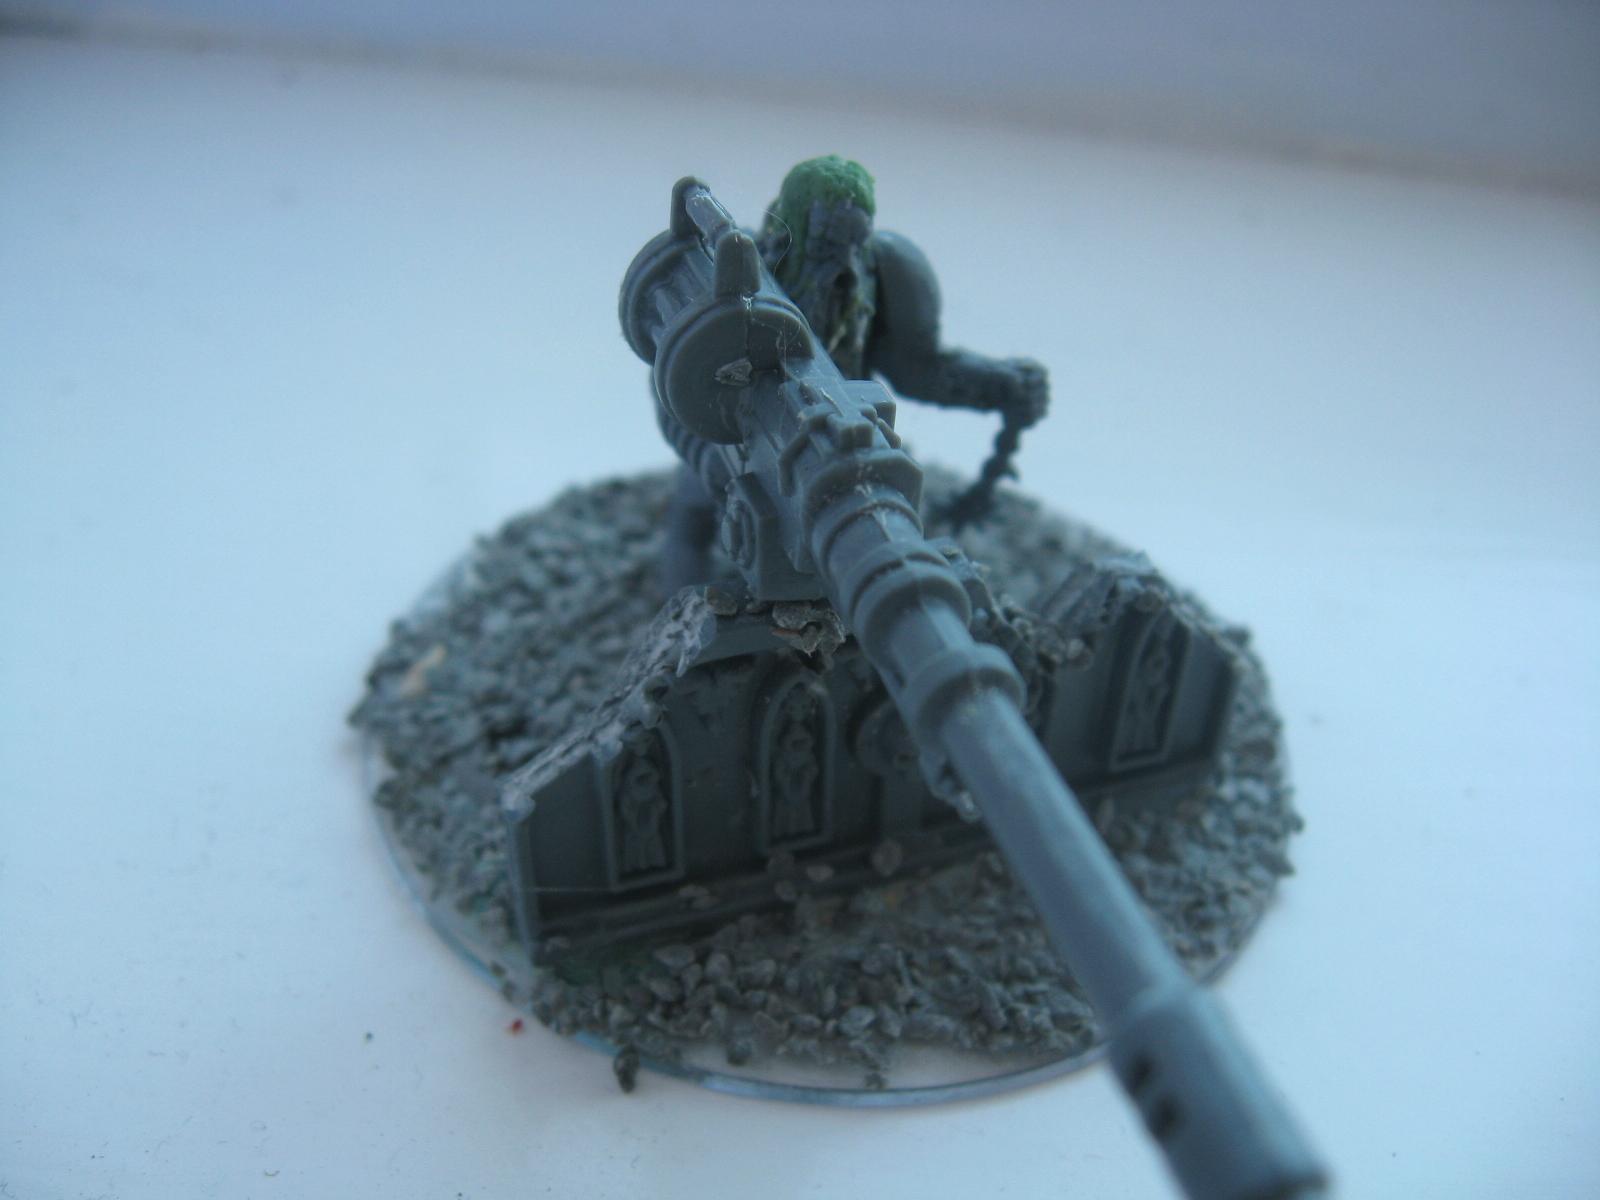 Autocannon, Cultist, Greenstuff, Sculpting